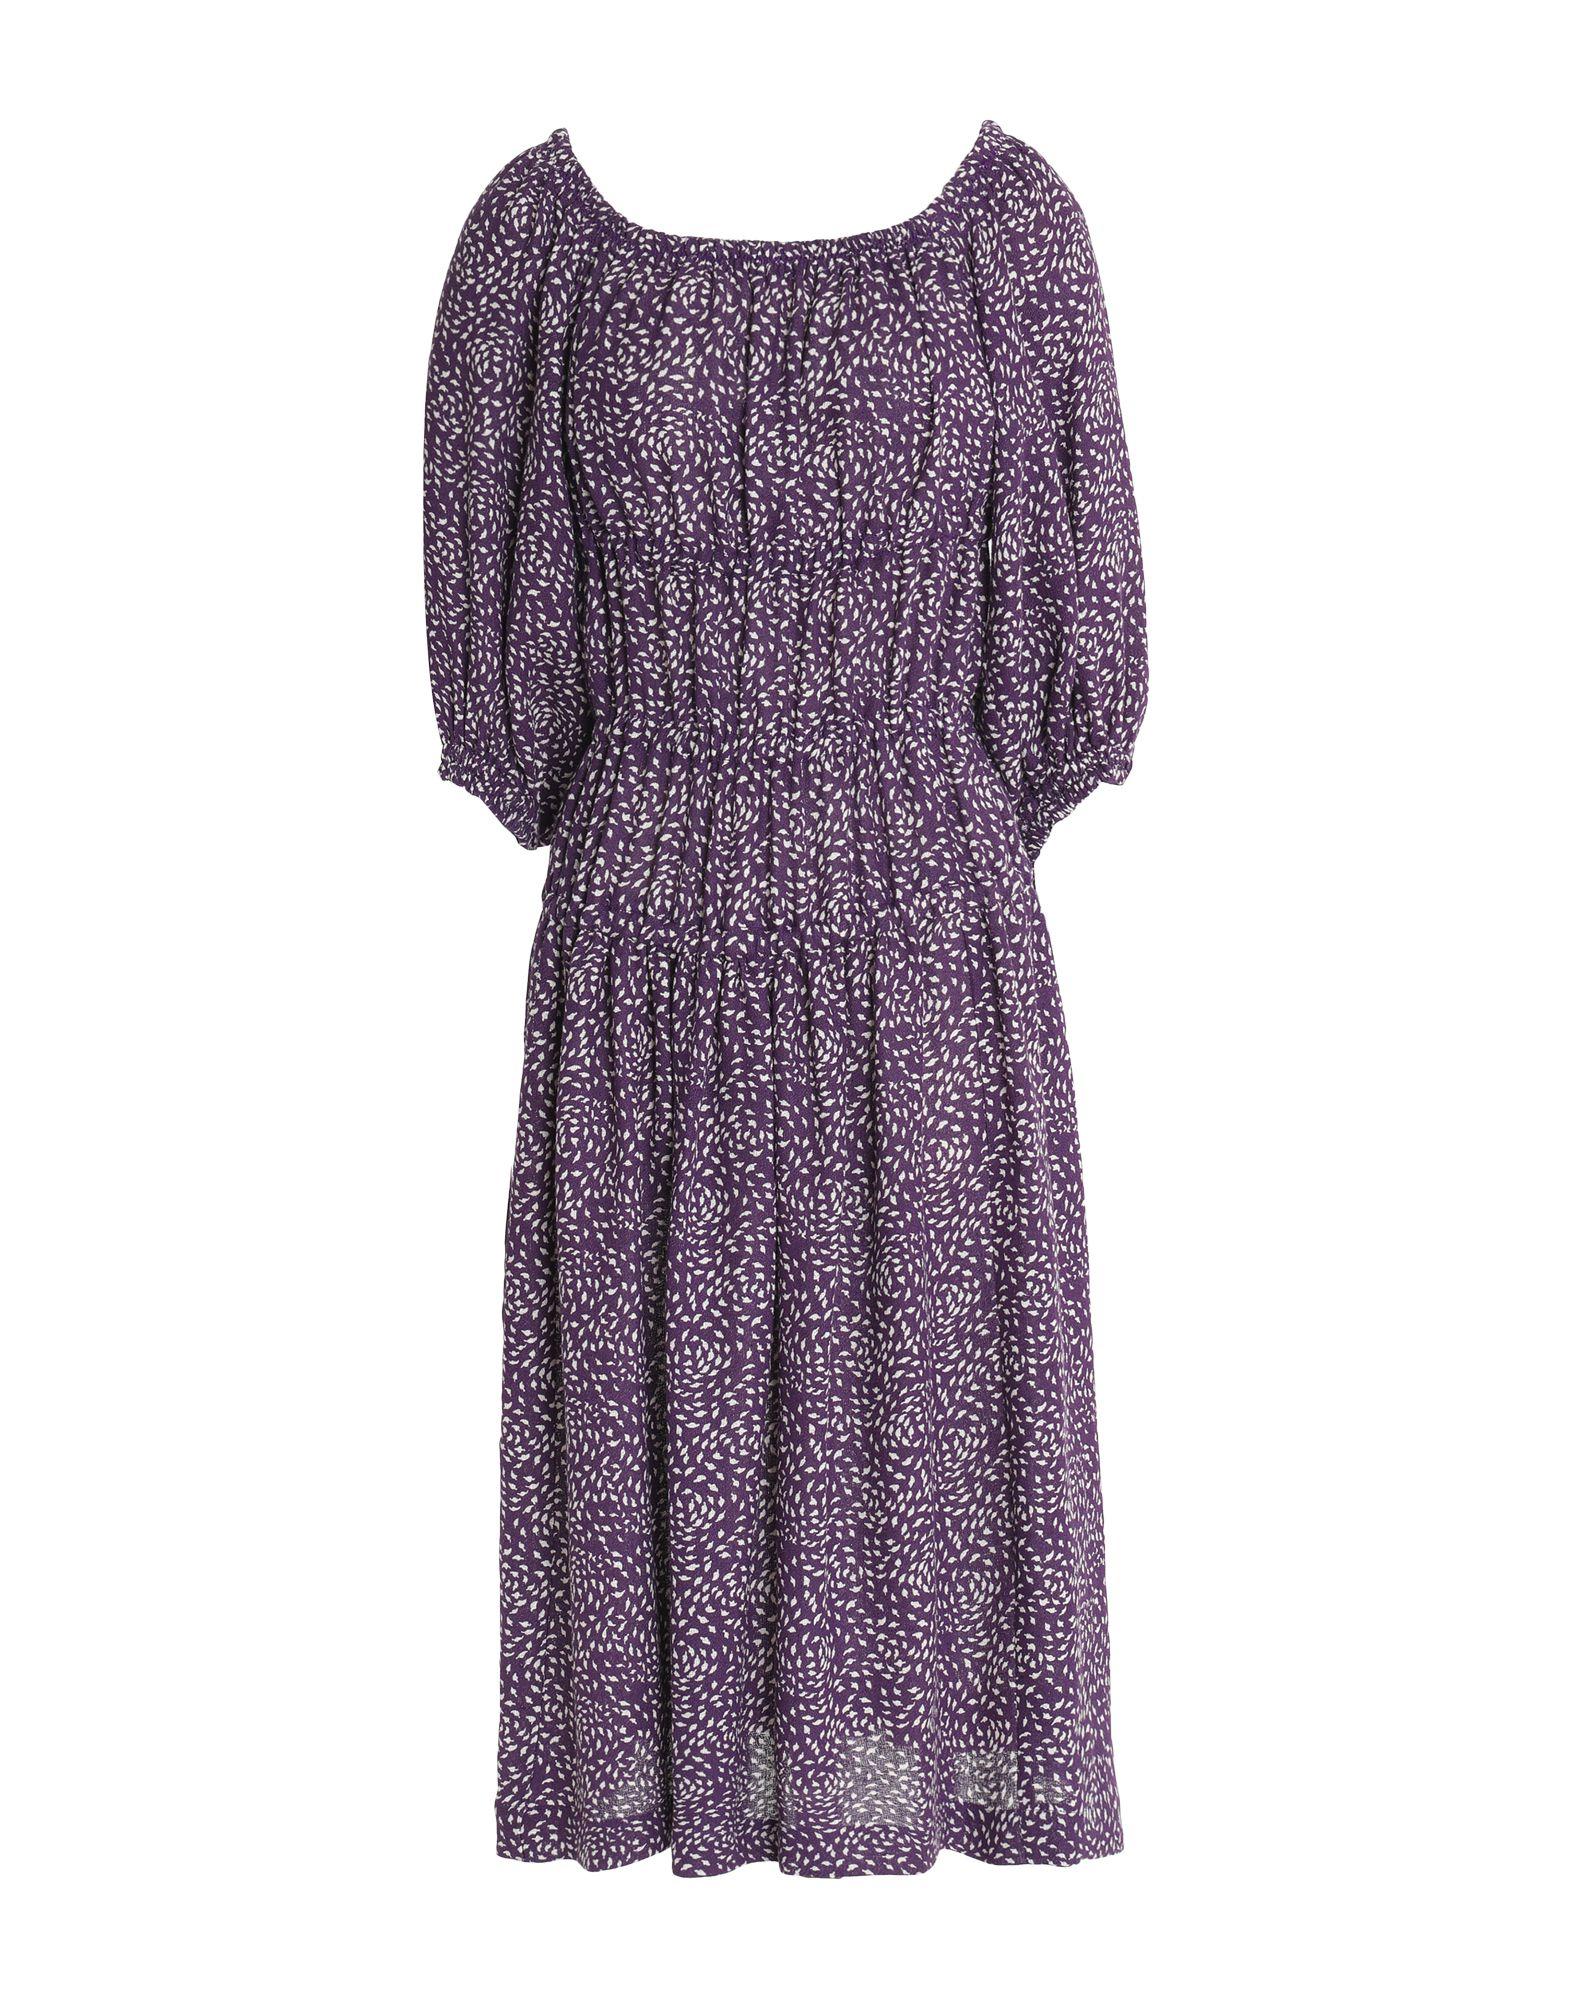 SONIA RYKIEL Платье длиной 3/4 boss black платье длиной 3 4